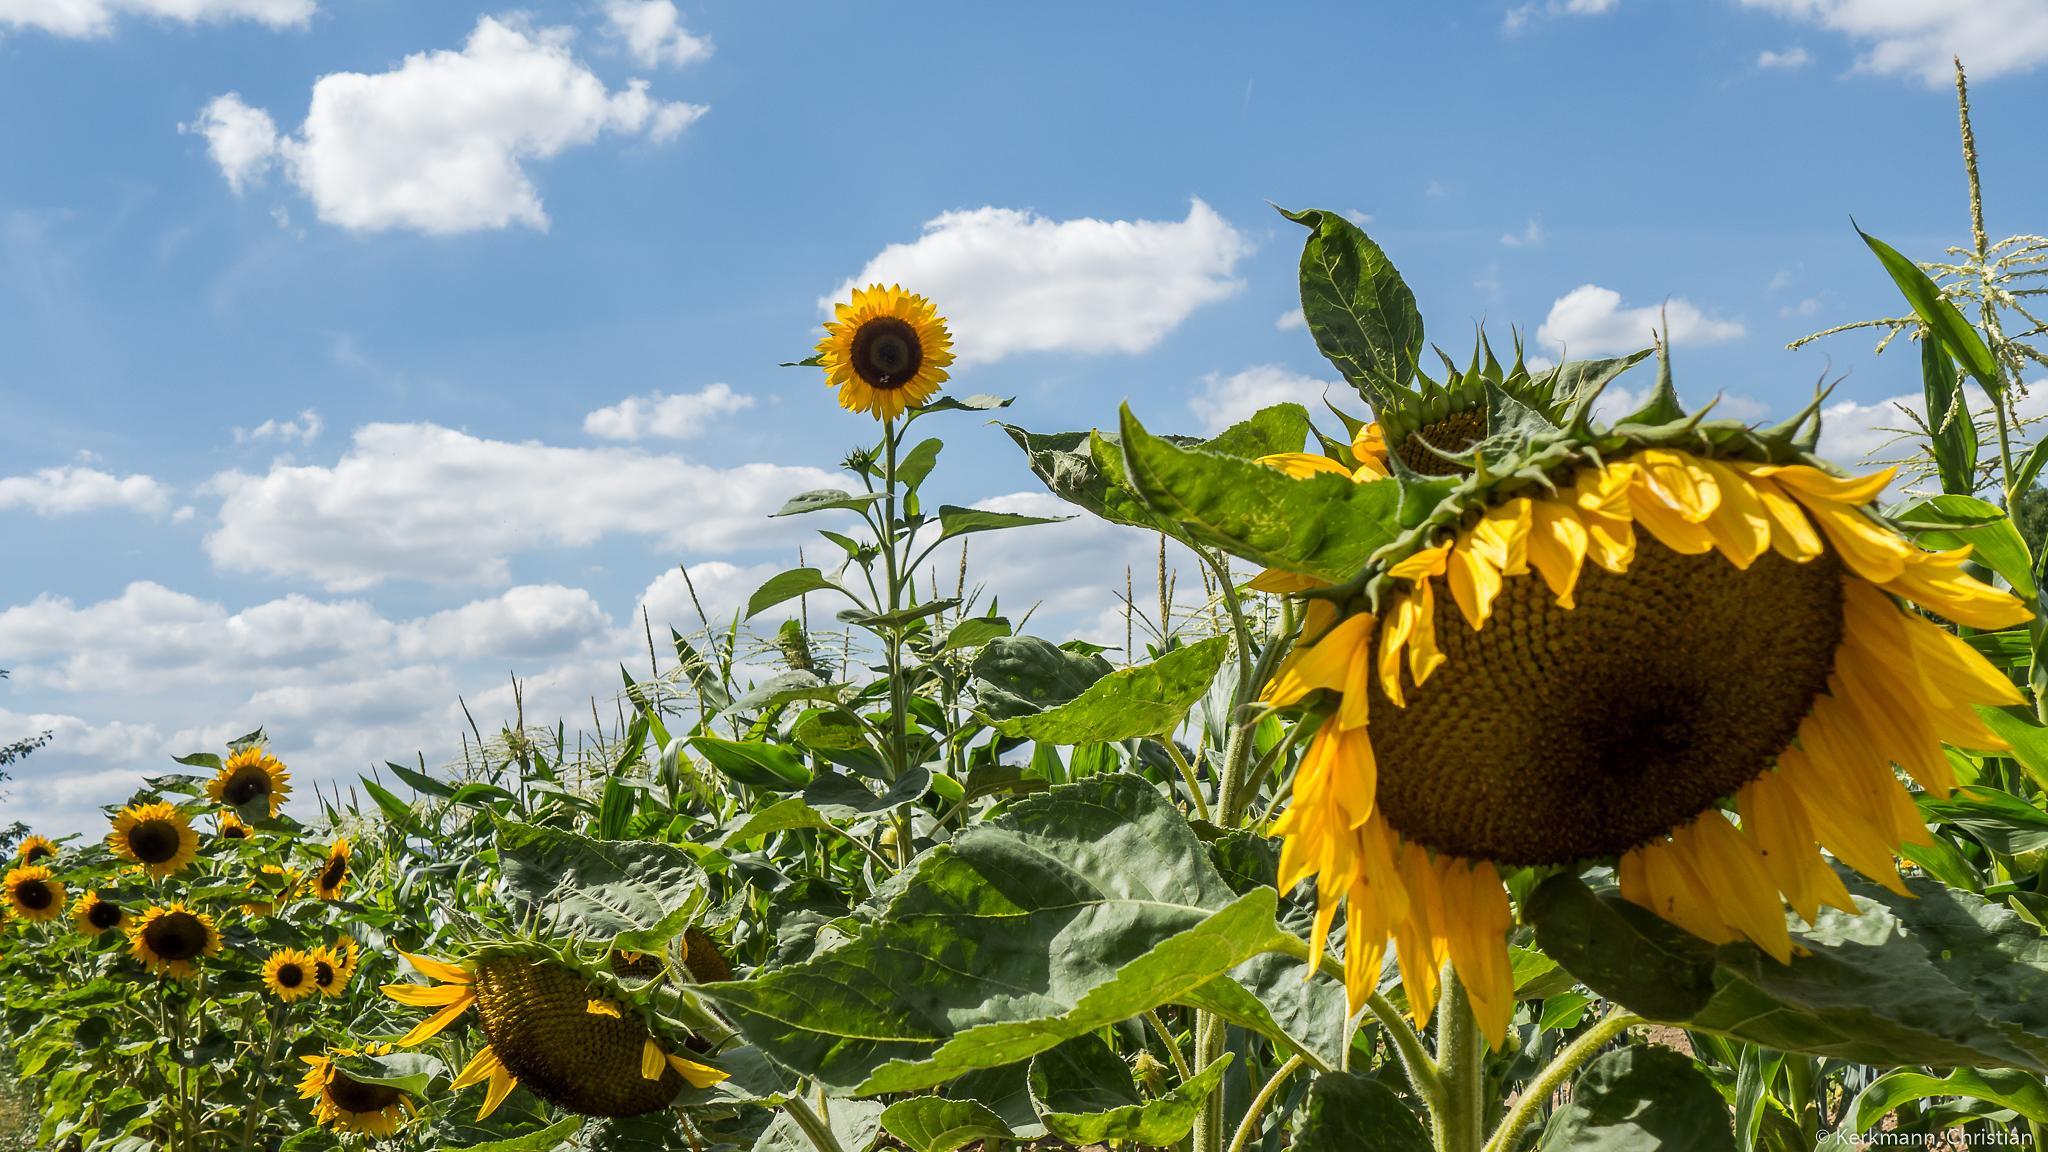 sunflower flied by Christian Kerkmann Photography